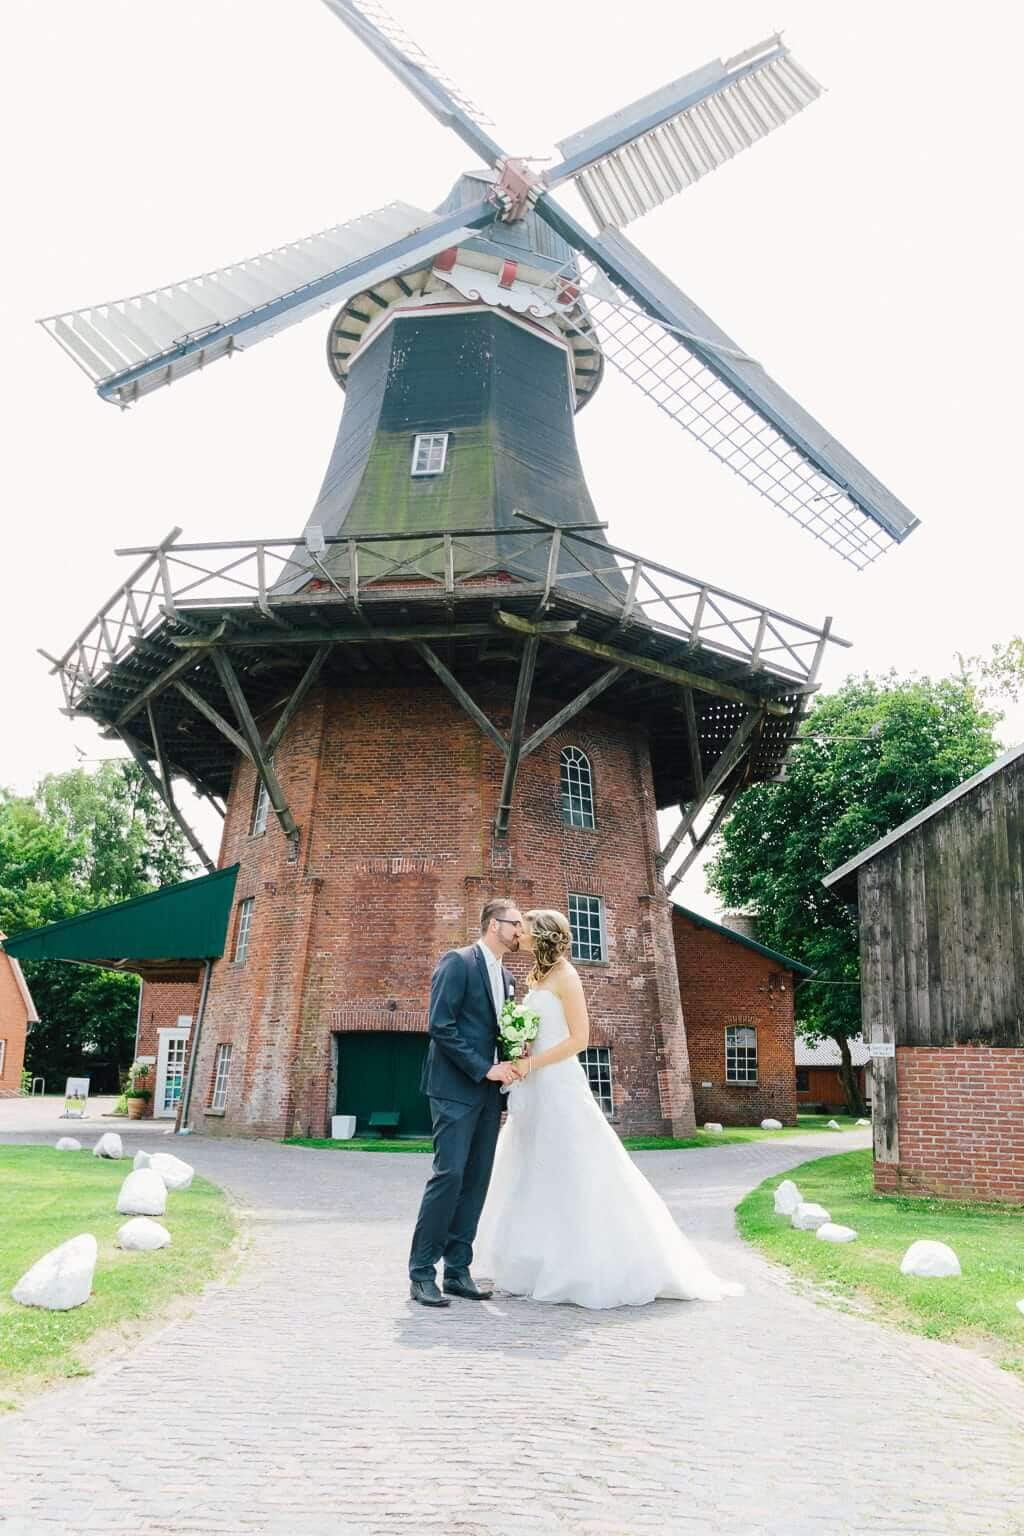 Brautpaar an der Moorseer Mühle